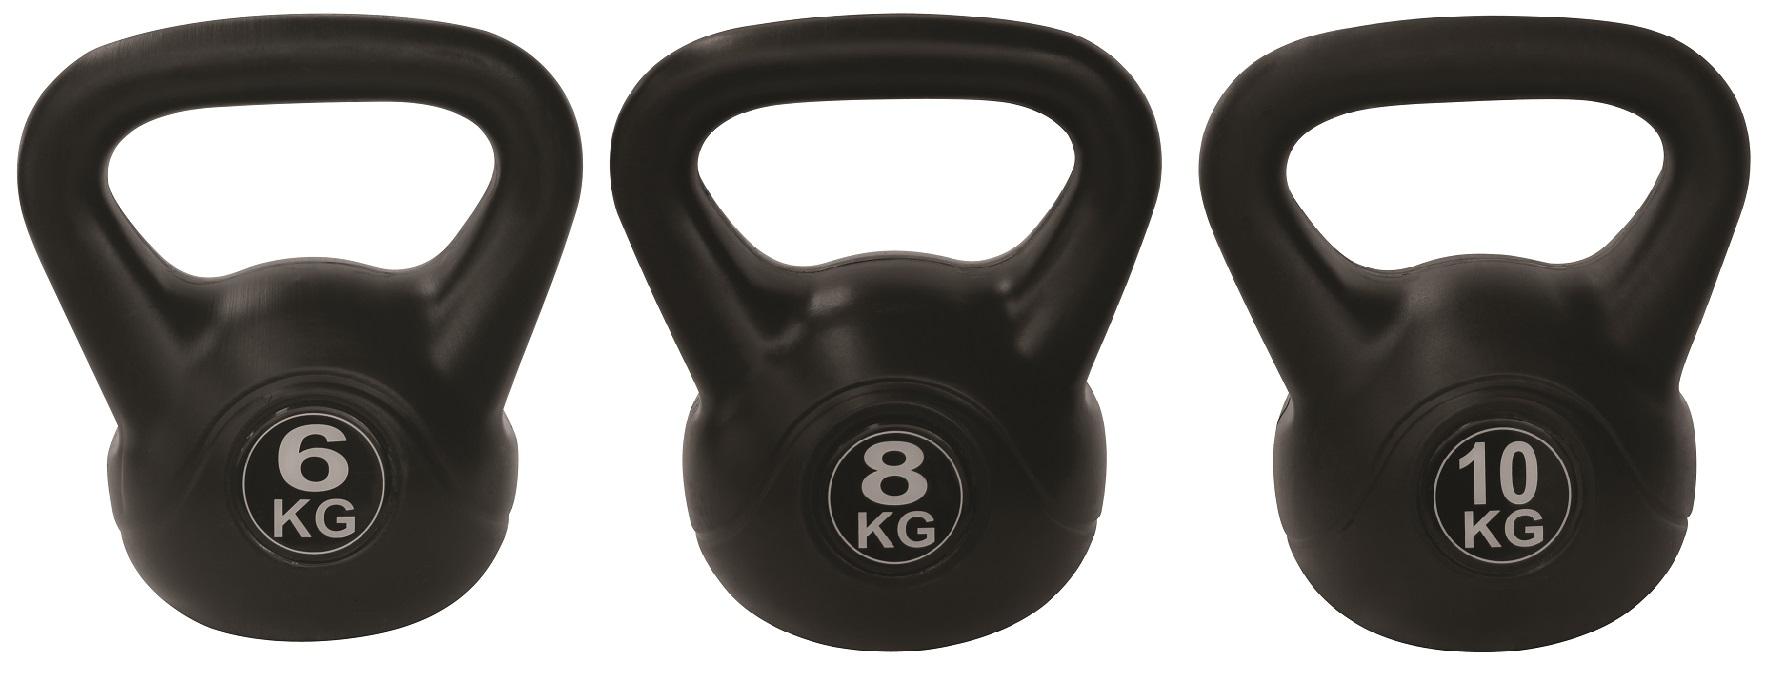 RS Aerobic Kettlebell 6KG